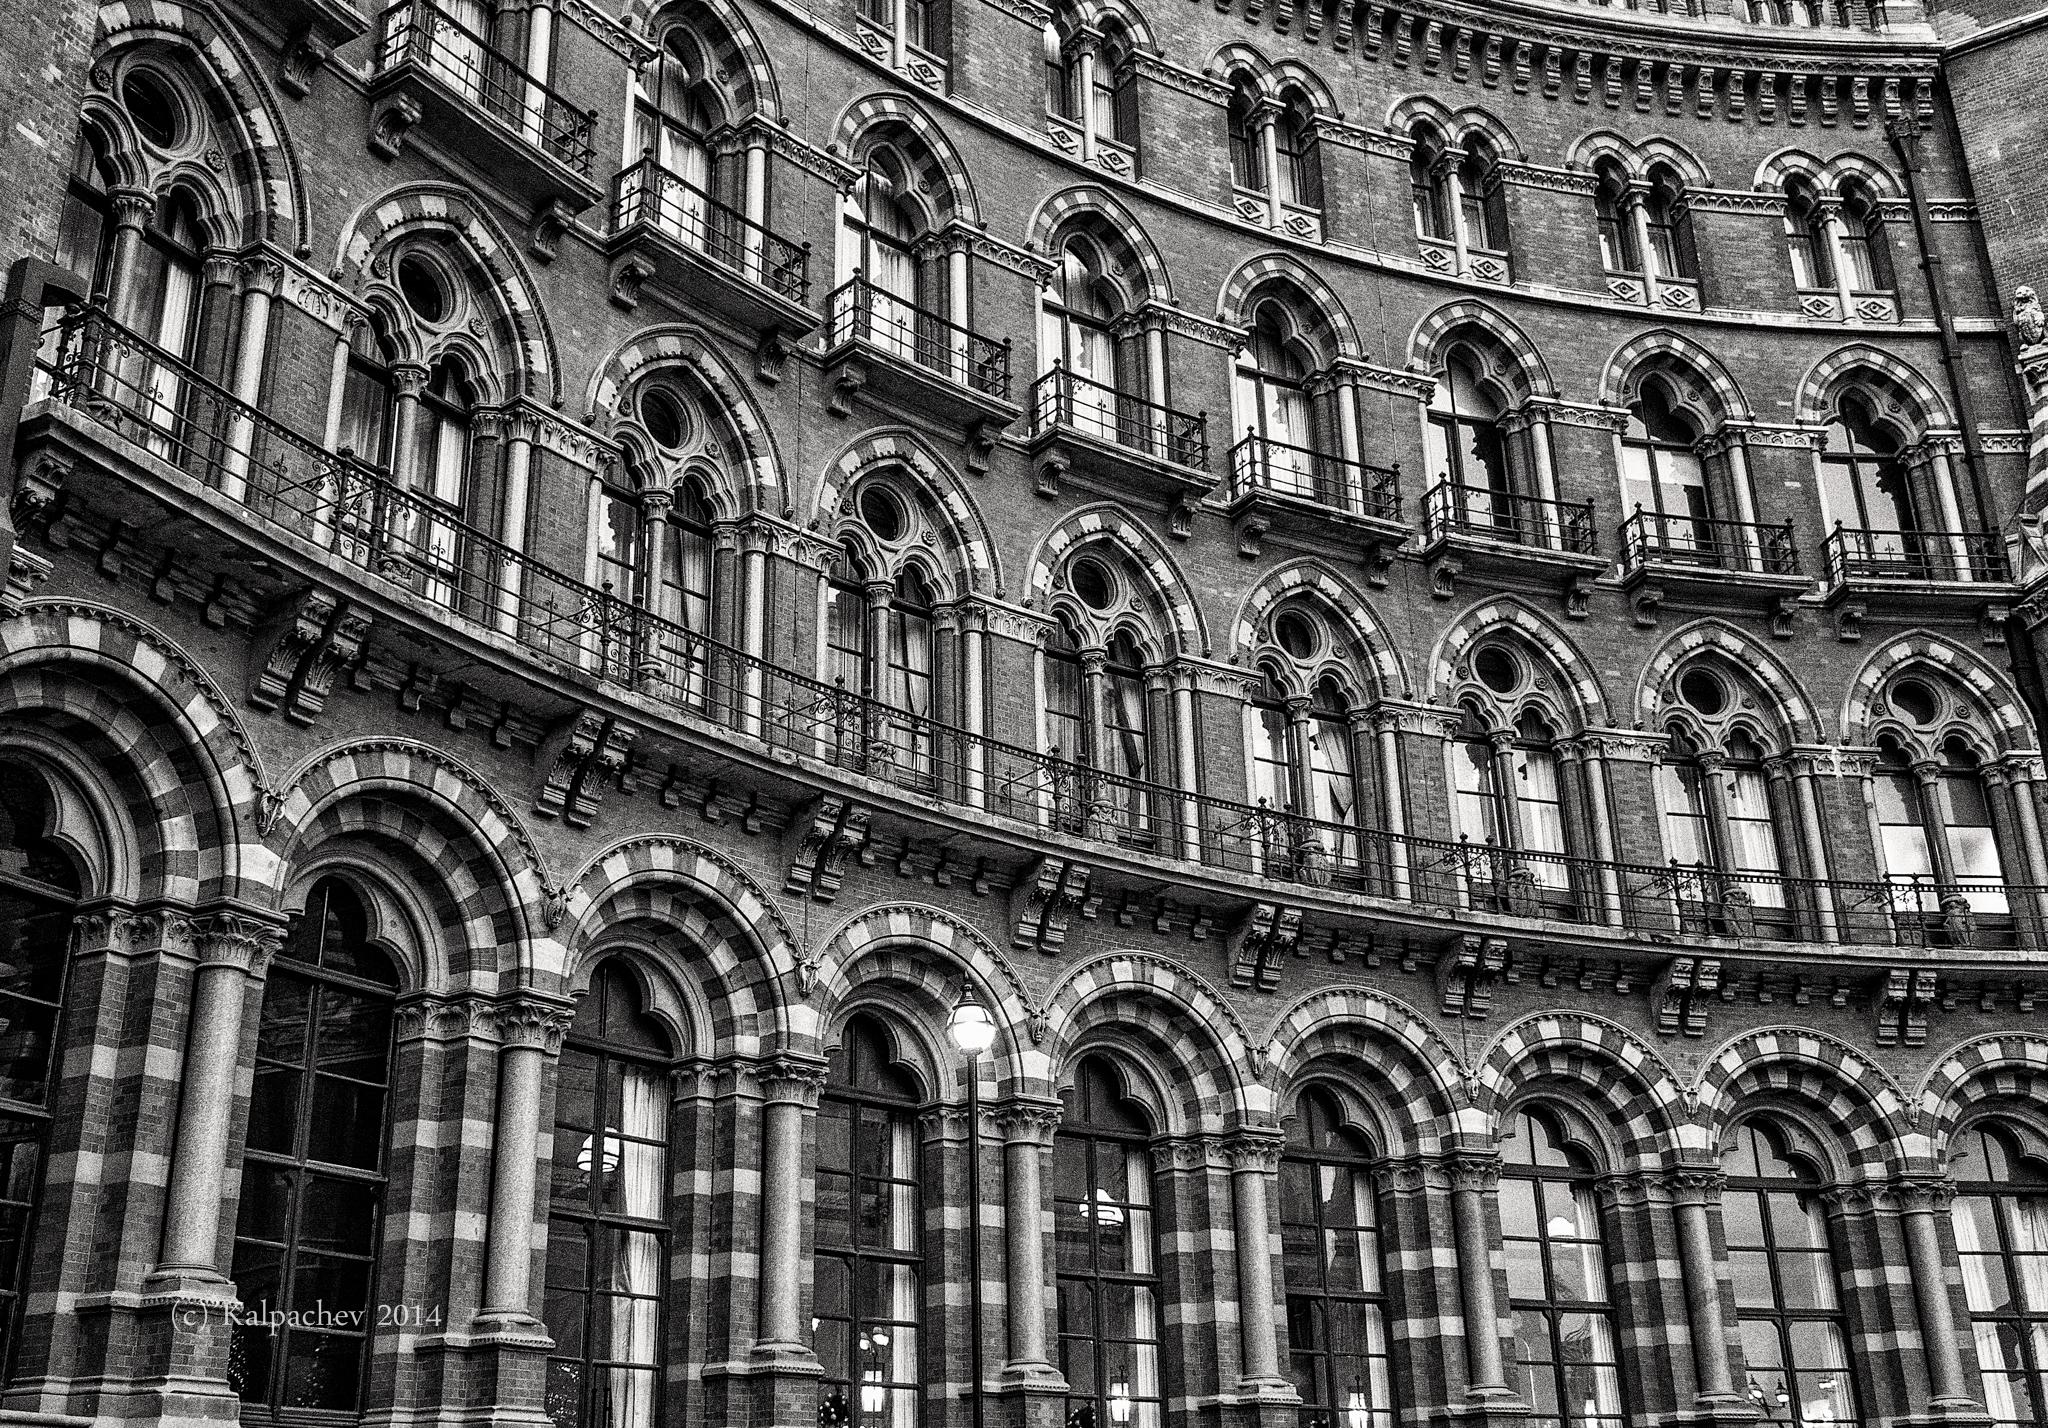 St. Pancras Renaissance London